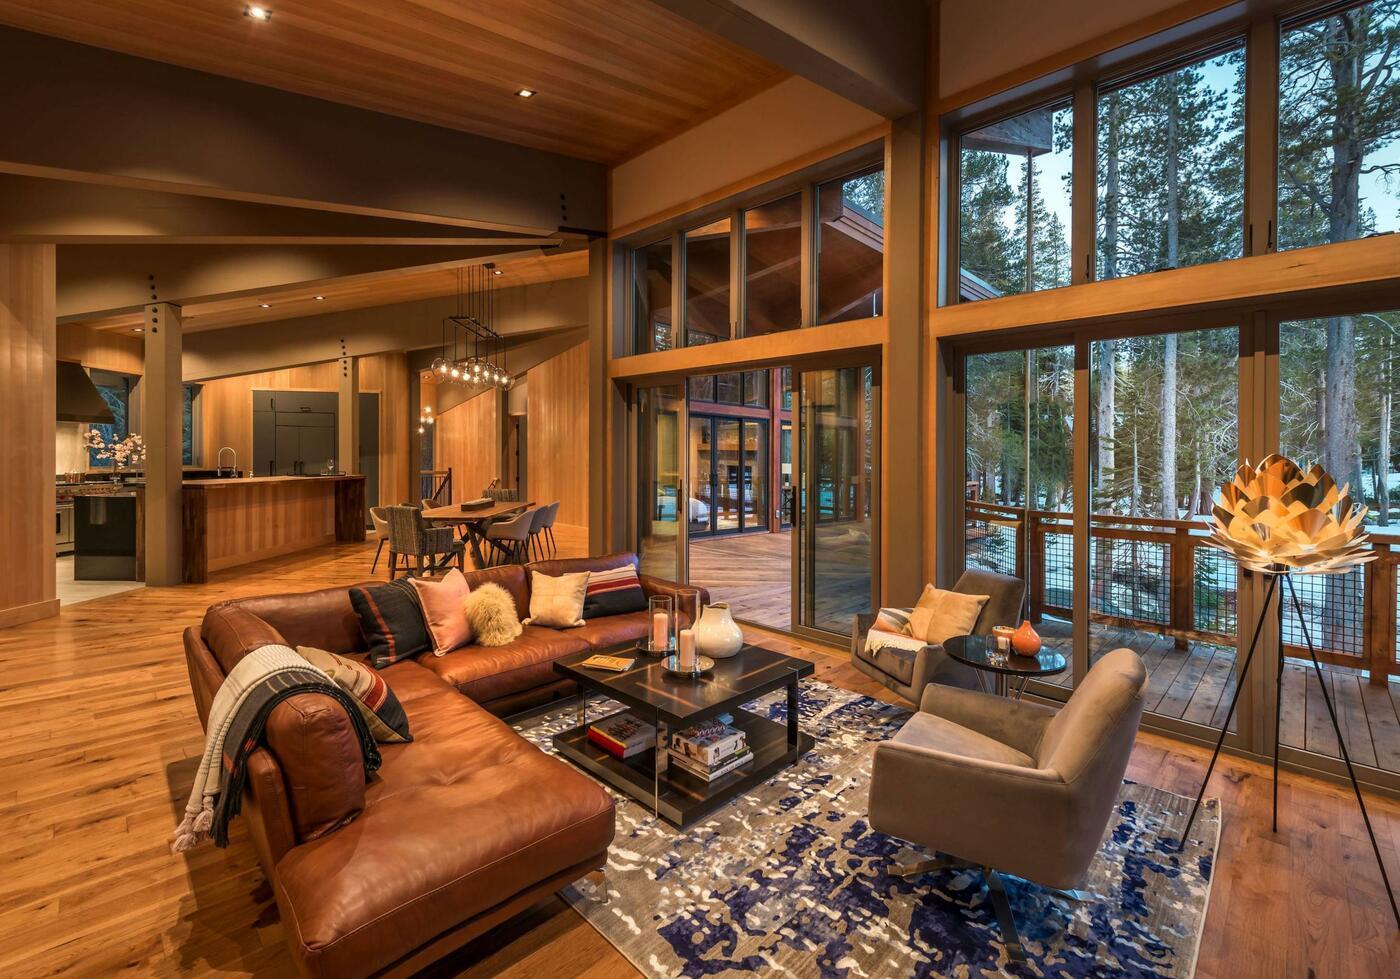 Wood floor, walls and ceiling, interior design ideas